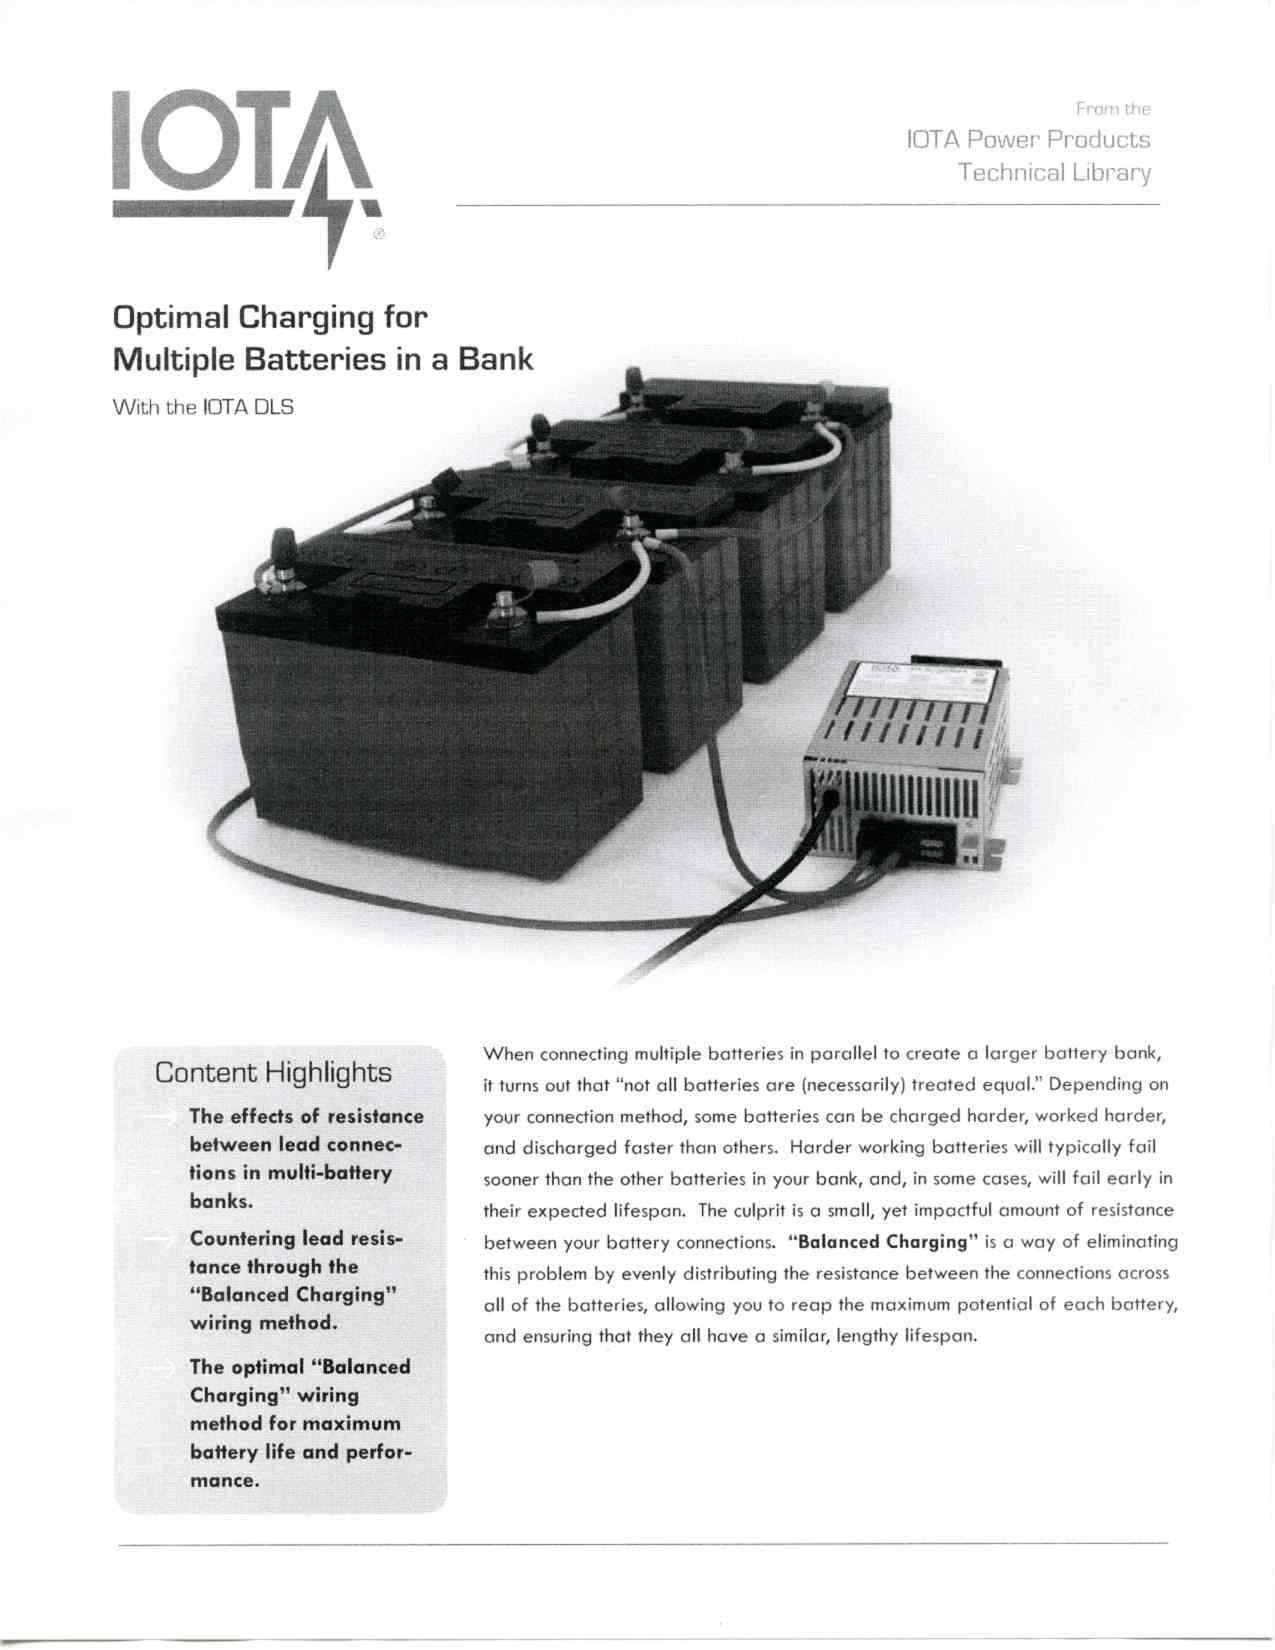 445afb720?resize\\\\\\\=665%2C861 power sentry ps300 wiring diagram power cable diagram, motor ps300 ballast wiring diagram at soozxer.org